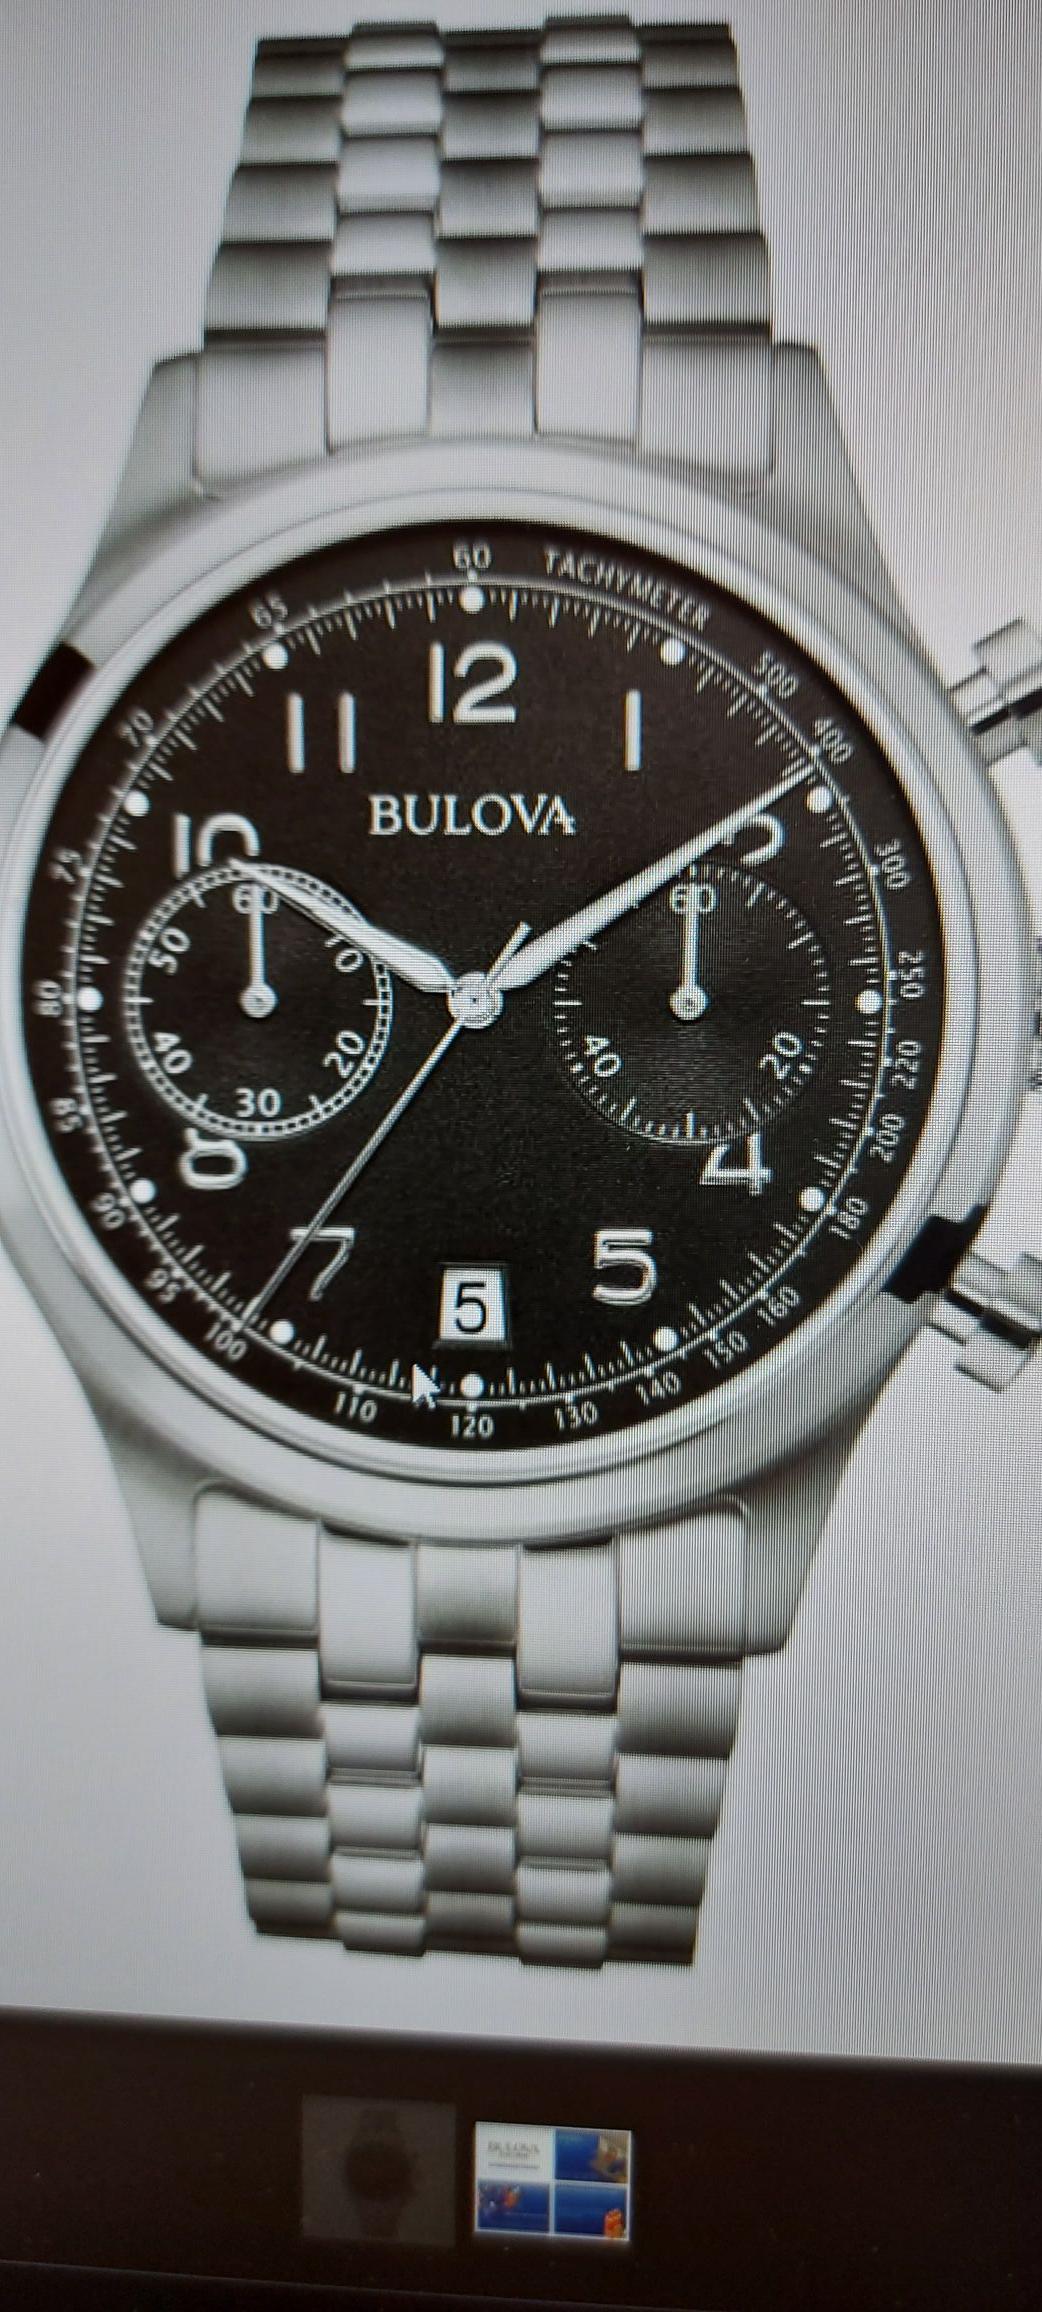 Zegarek Bulova Classic Chronograoh